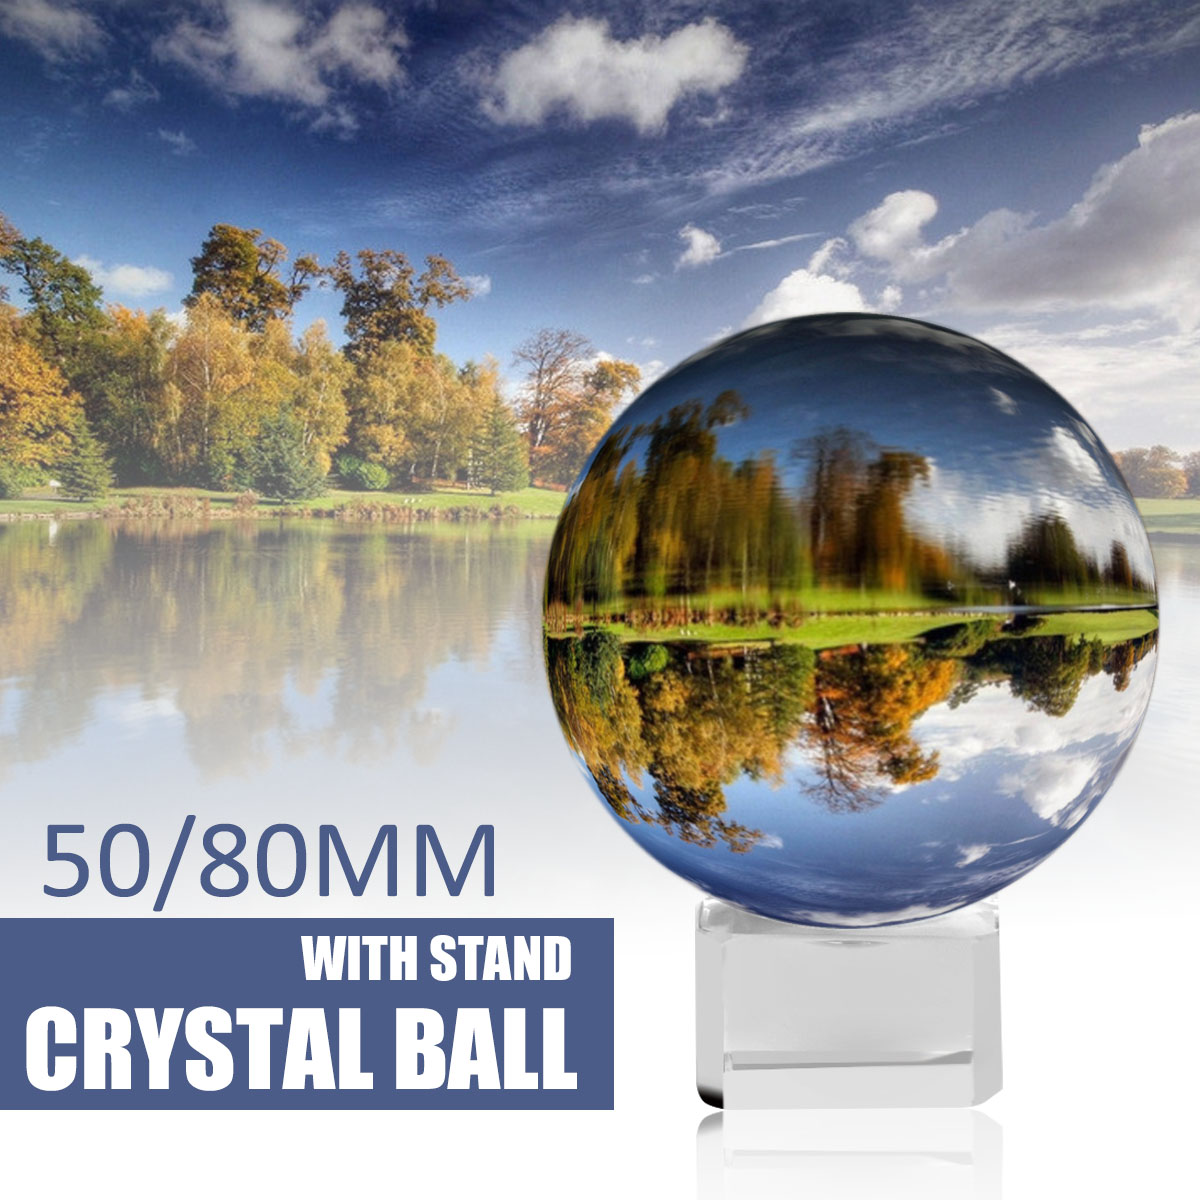 Bola de cristal esfera 50mm 80mm con soporte 2 fotografía Lensball Fondo decoración K9 cristal claro lente bola